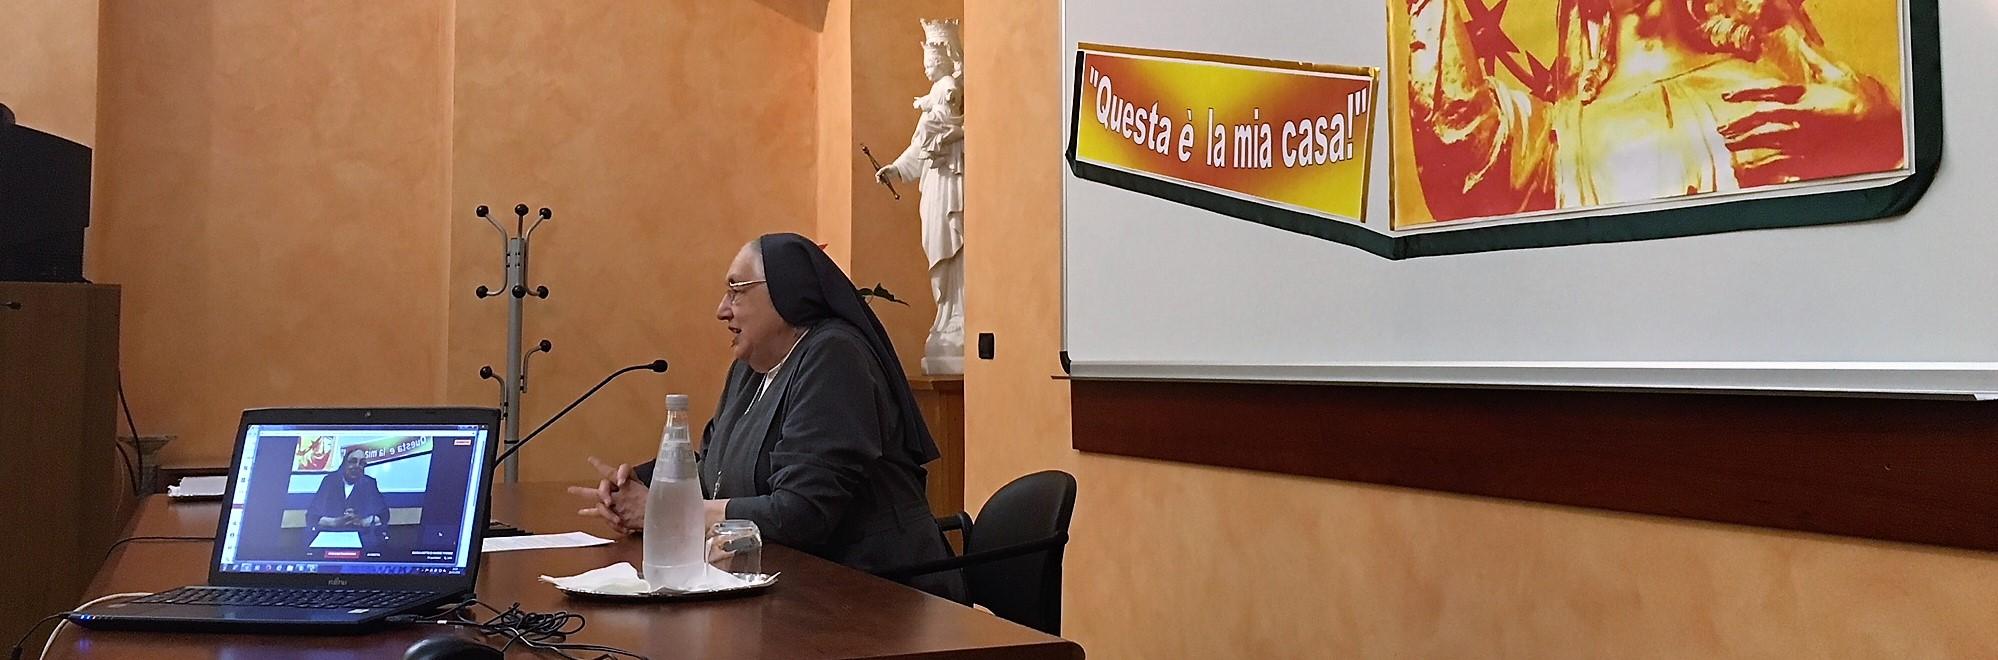 FESTA DI MARIA AUSILIATRICE 2018: BUONA NOTTE DI MADRE YVONNE REUNGOAT